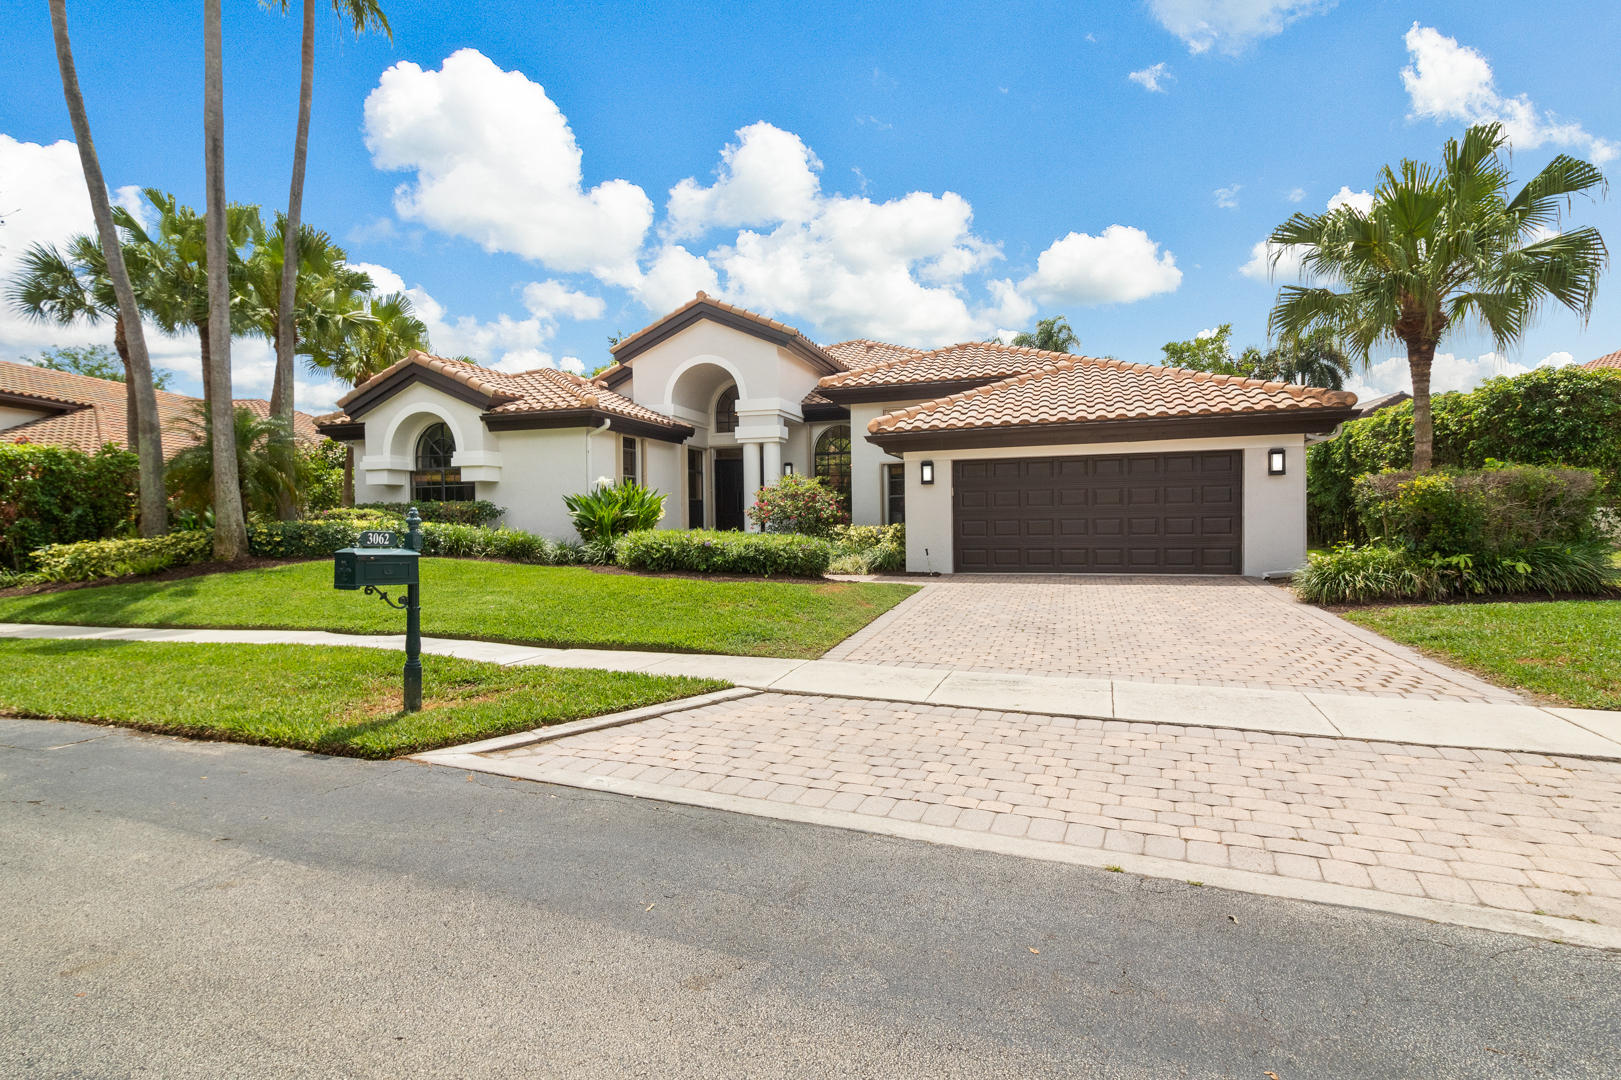 Photo of 3062 NW 61st Street, Boca Raton, FL 33496